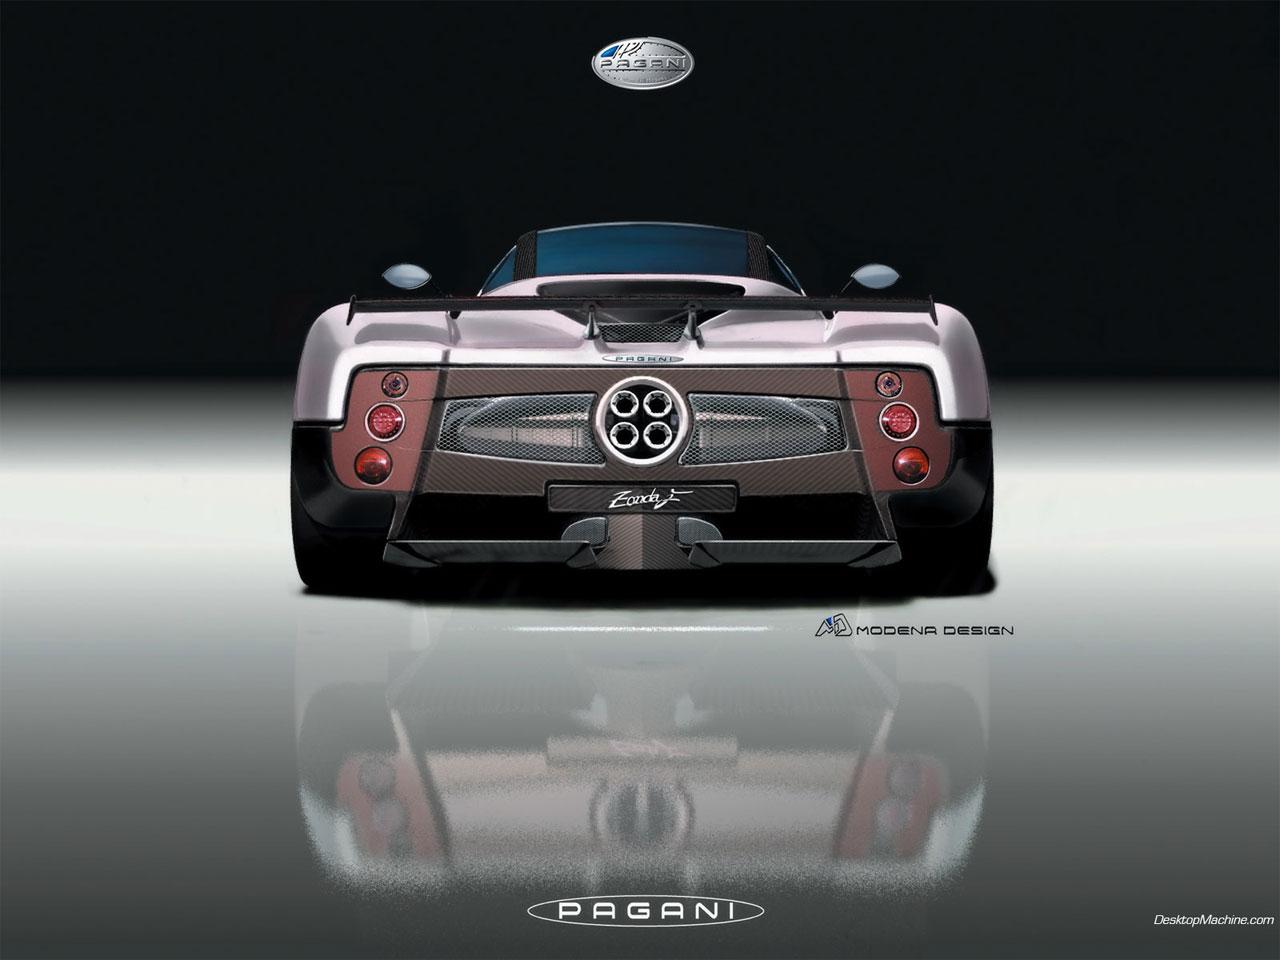 Hot Cars - Zonda F